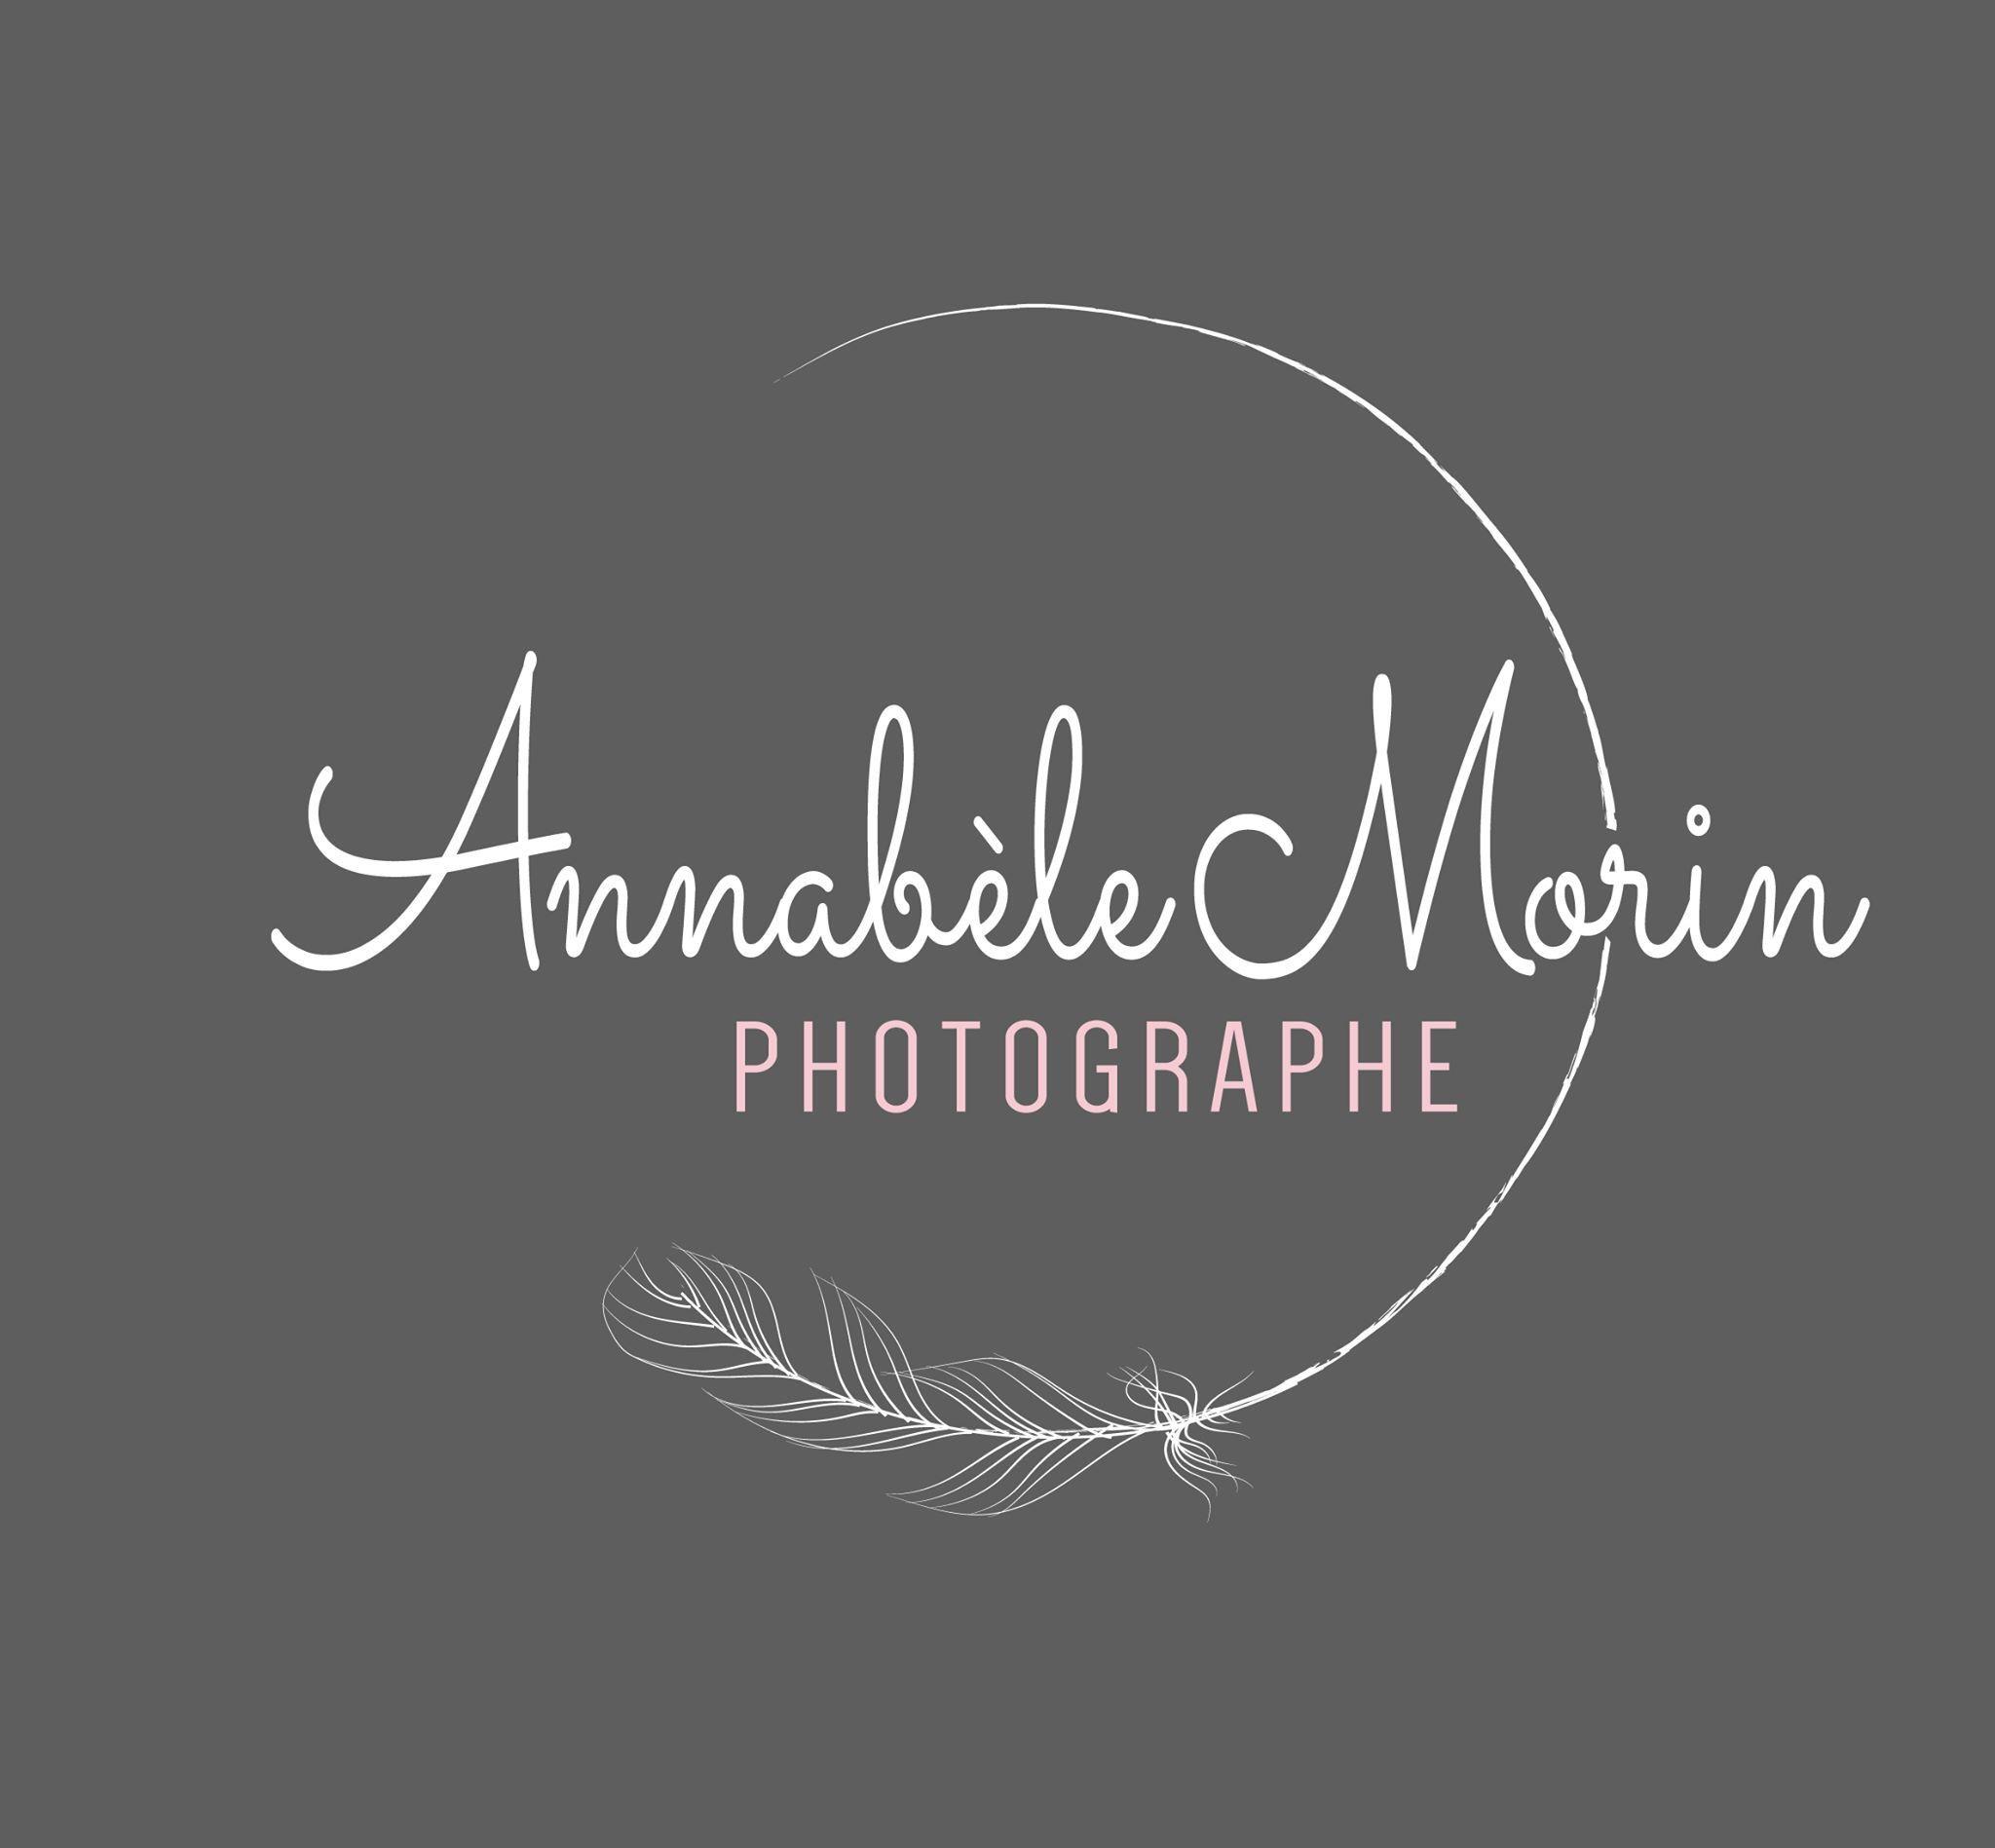 Photography design - feather logo design - gypsy logo design - feminine logo